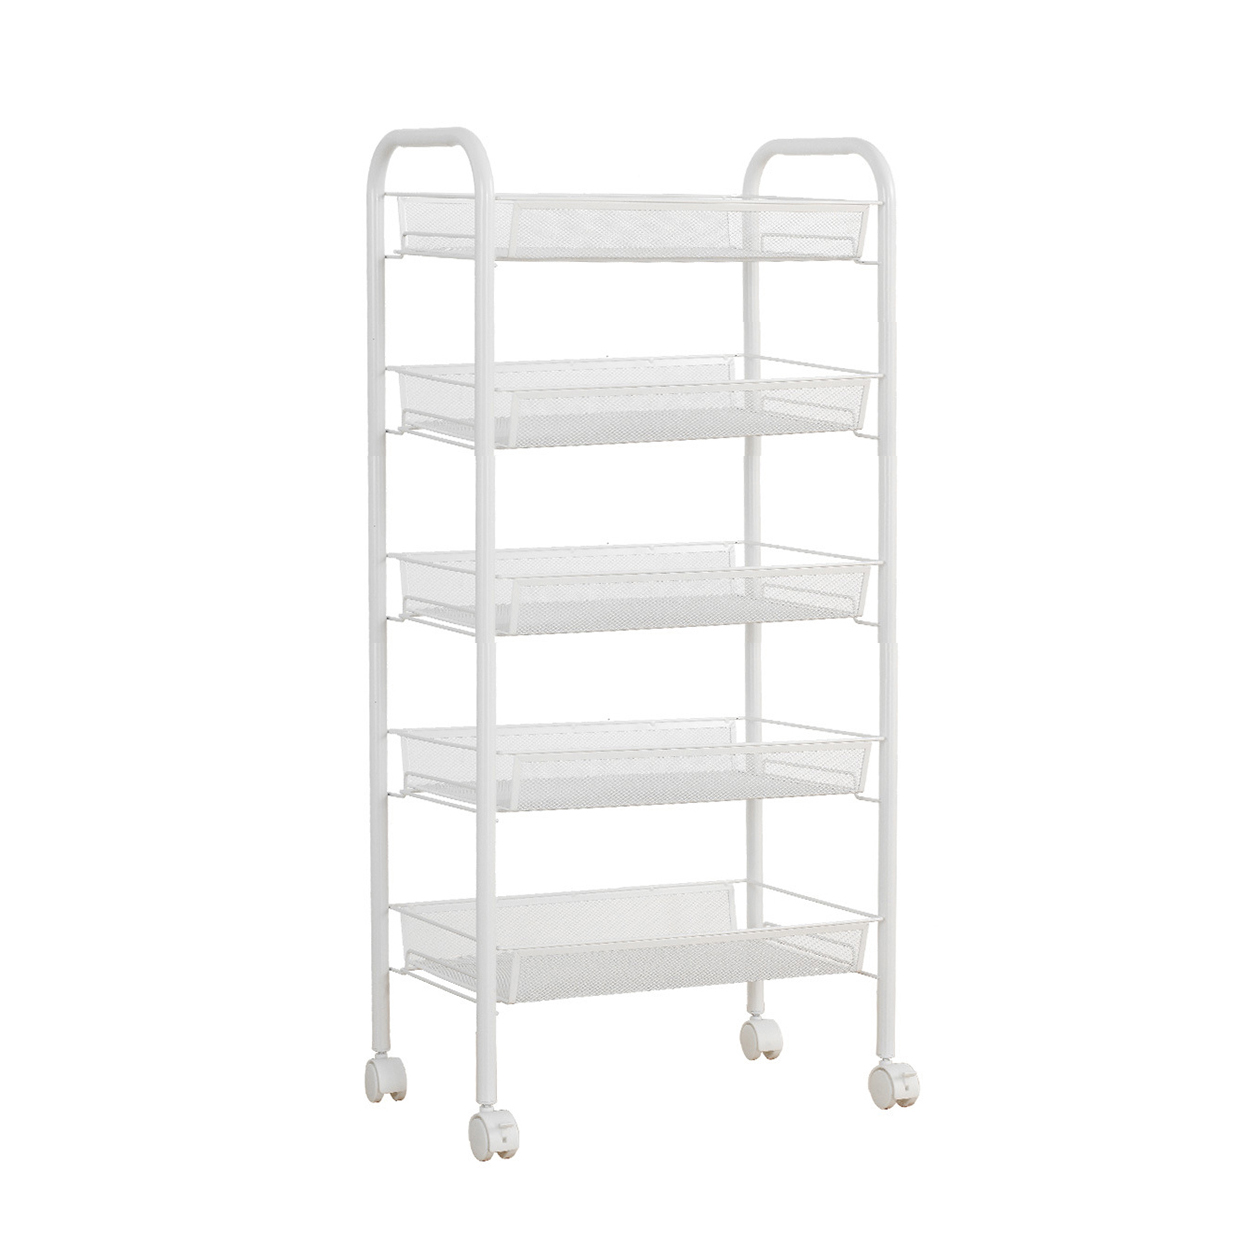 SDFC White Metal Mesh Rolling Cart Storage Rack Shelves with Wheels ...